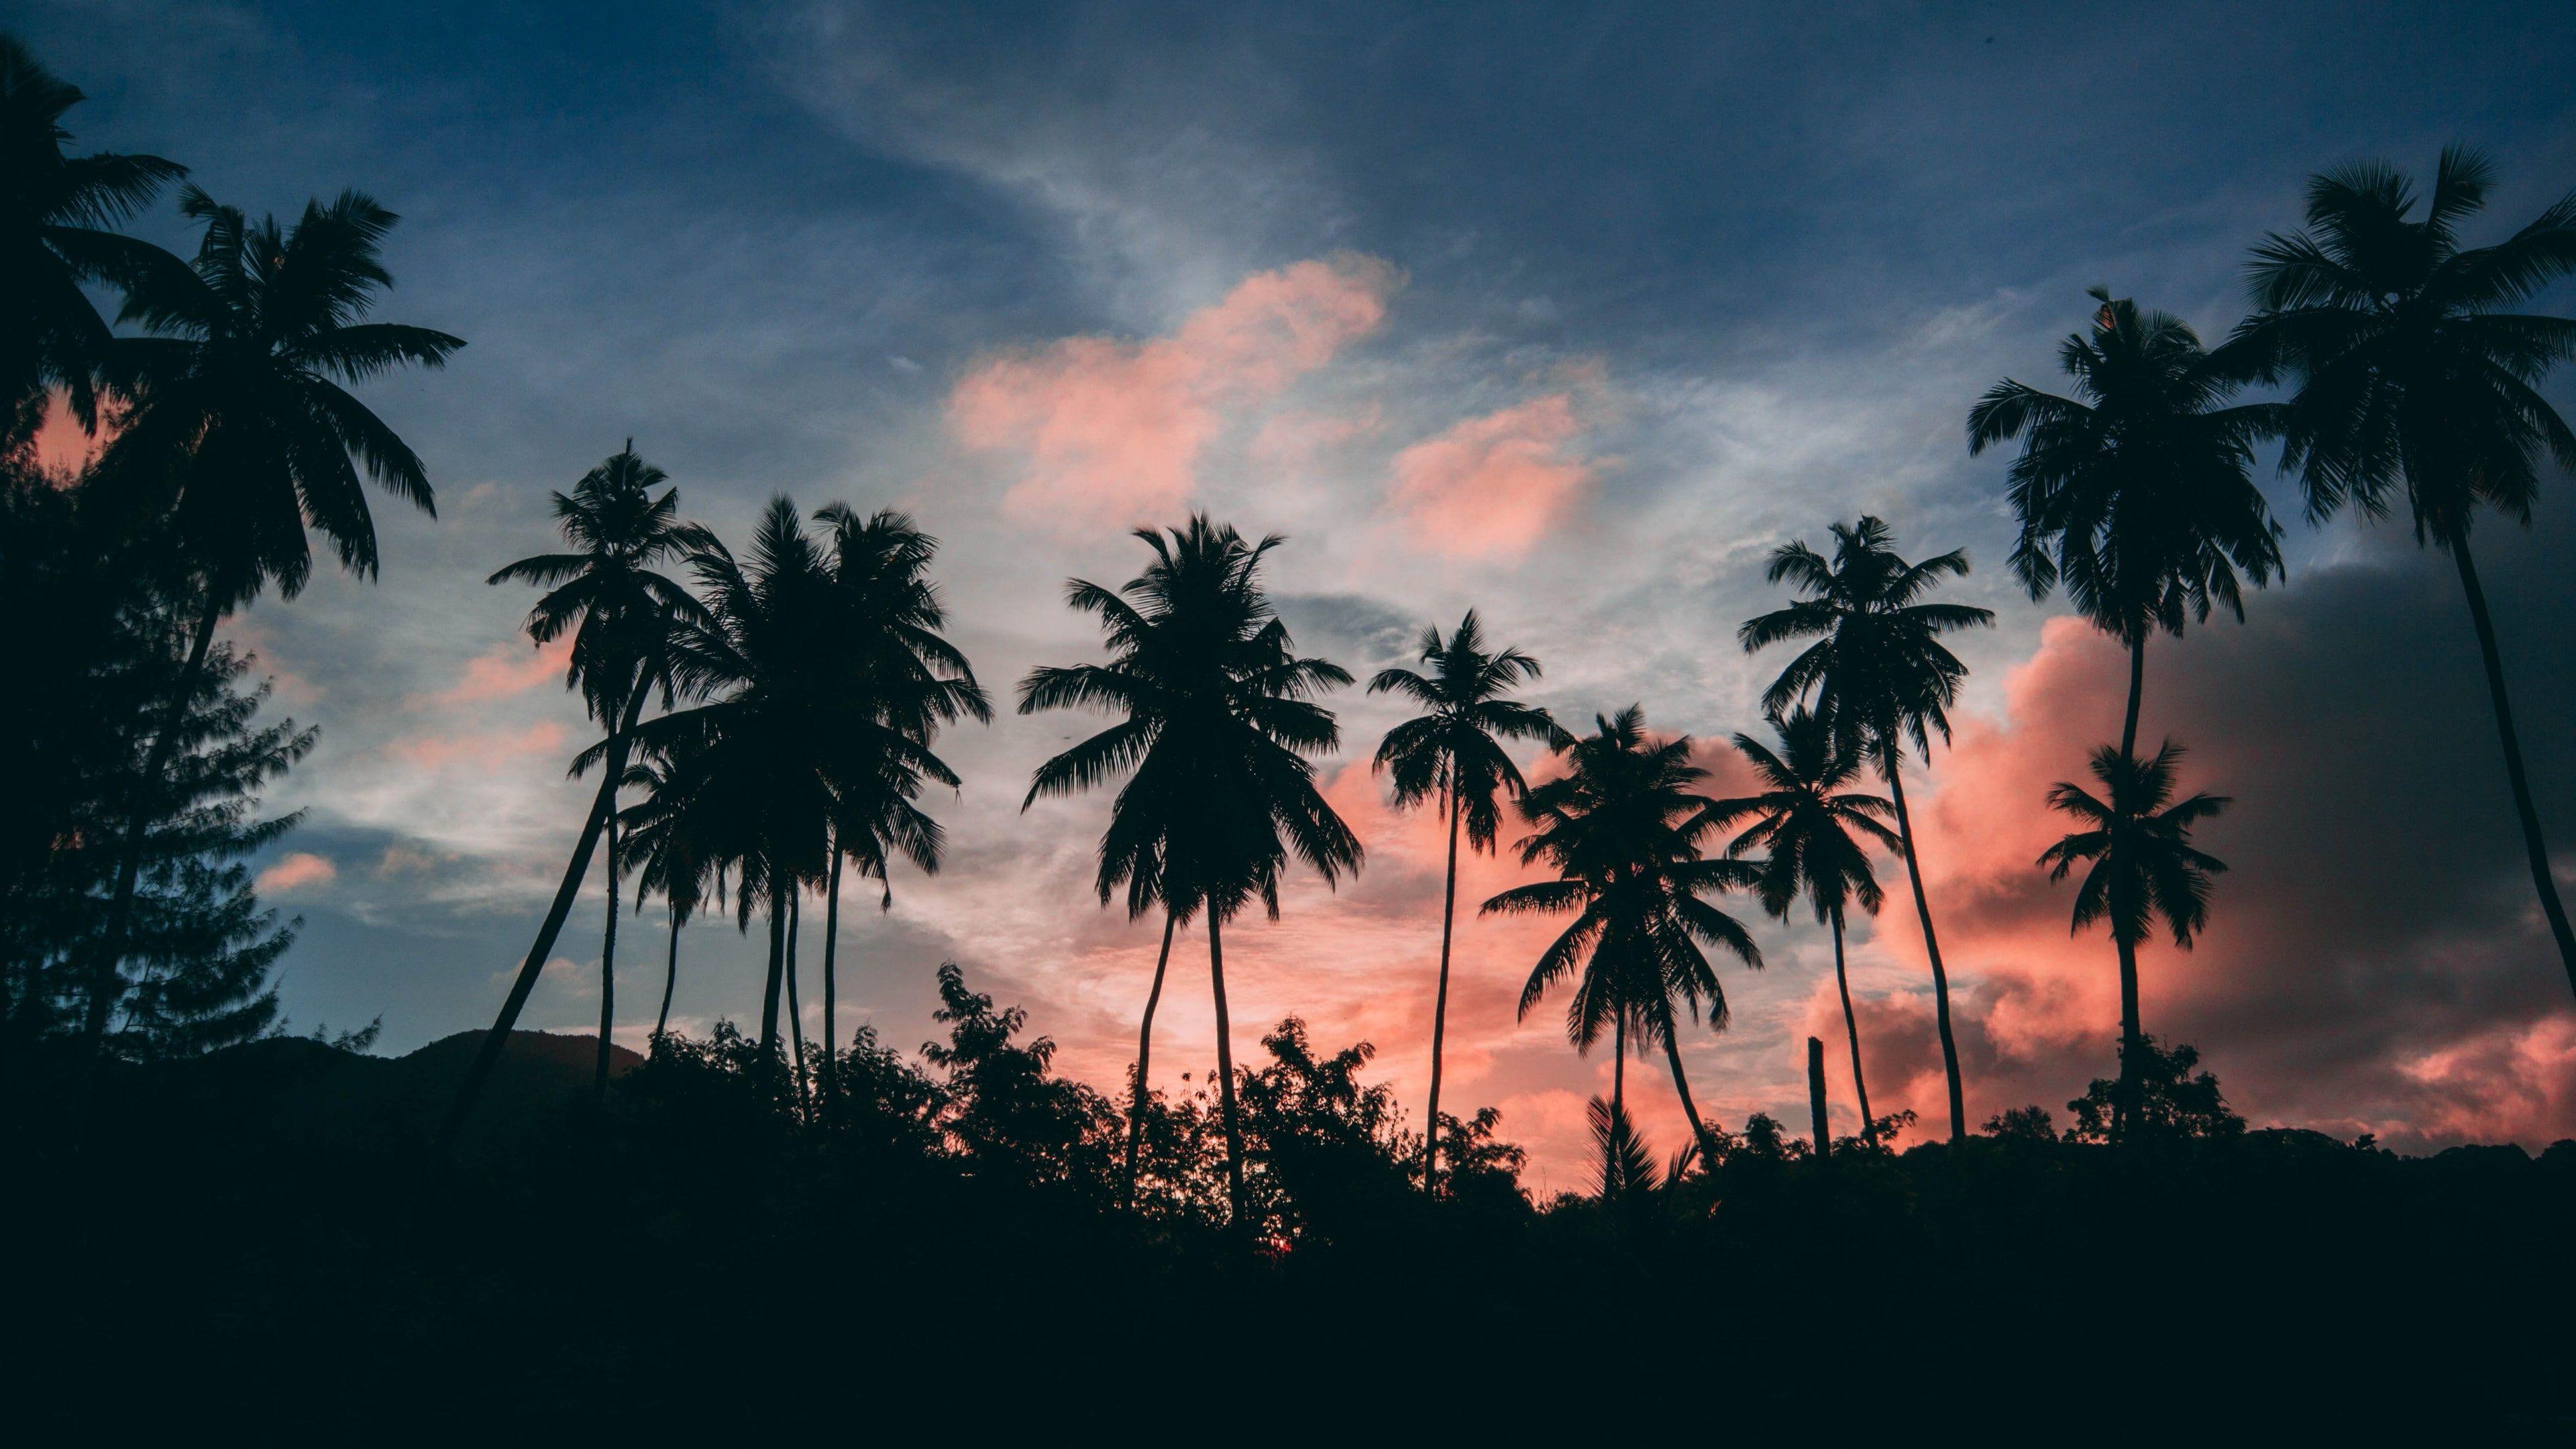 Silhouette Palm Tree Dusk Palms Evening Sky Tropical Sunset Palm Sunset Twilight California Iphone Wallpaper Sunset Wallpaper Abstract Iphone Wallpaper